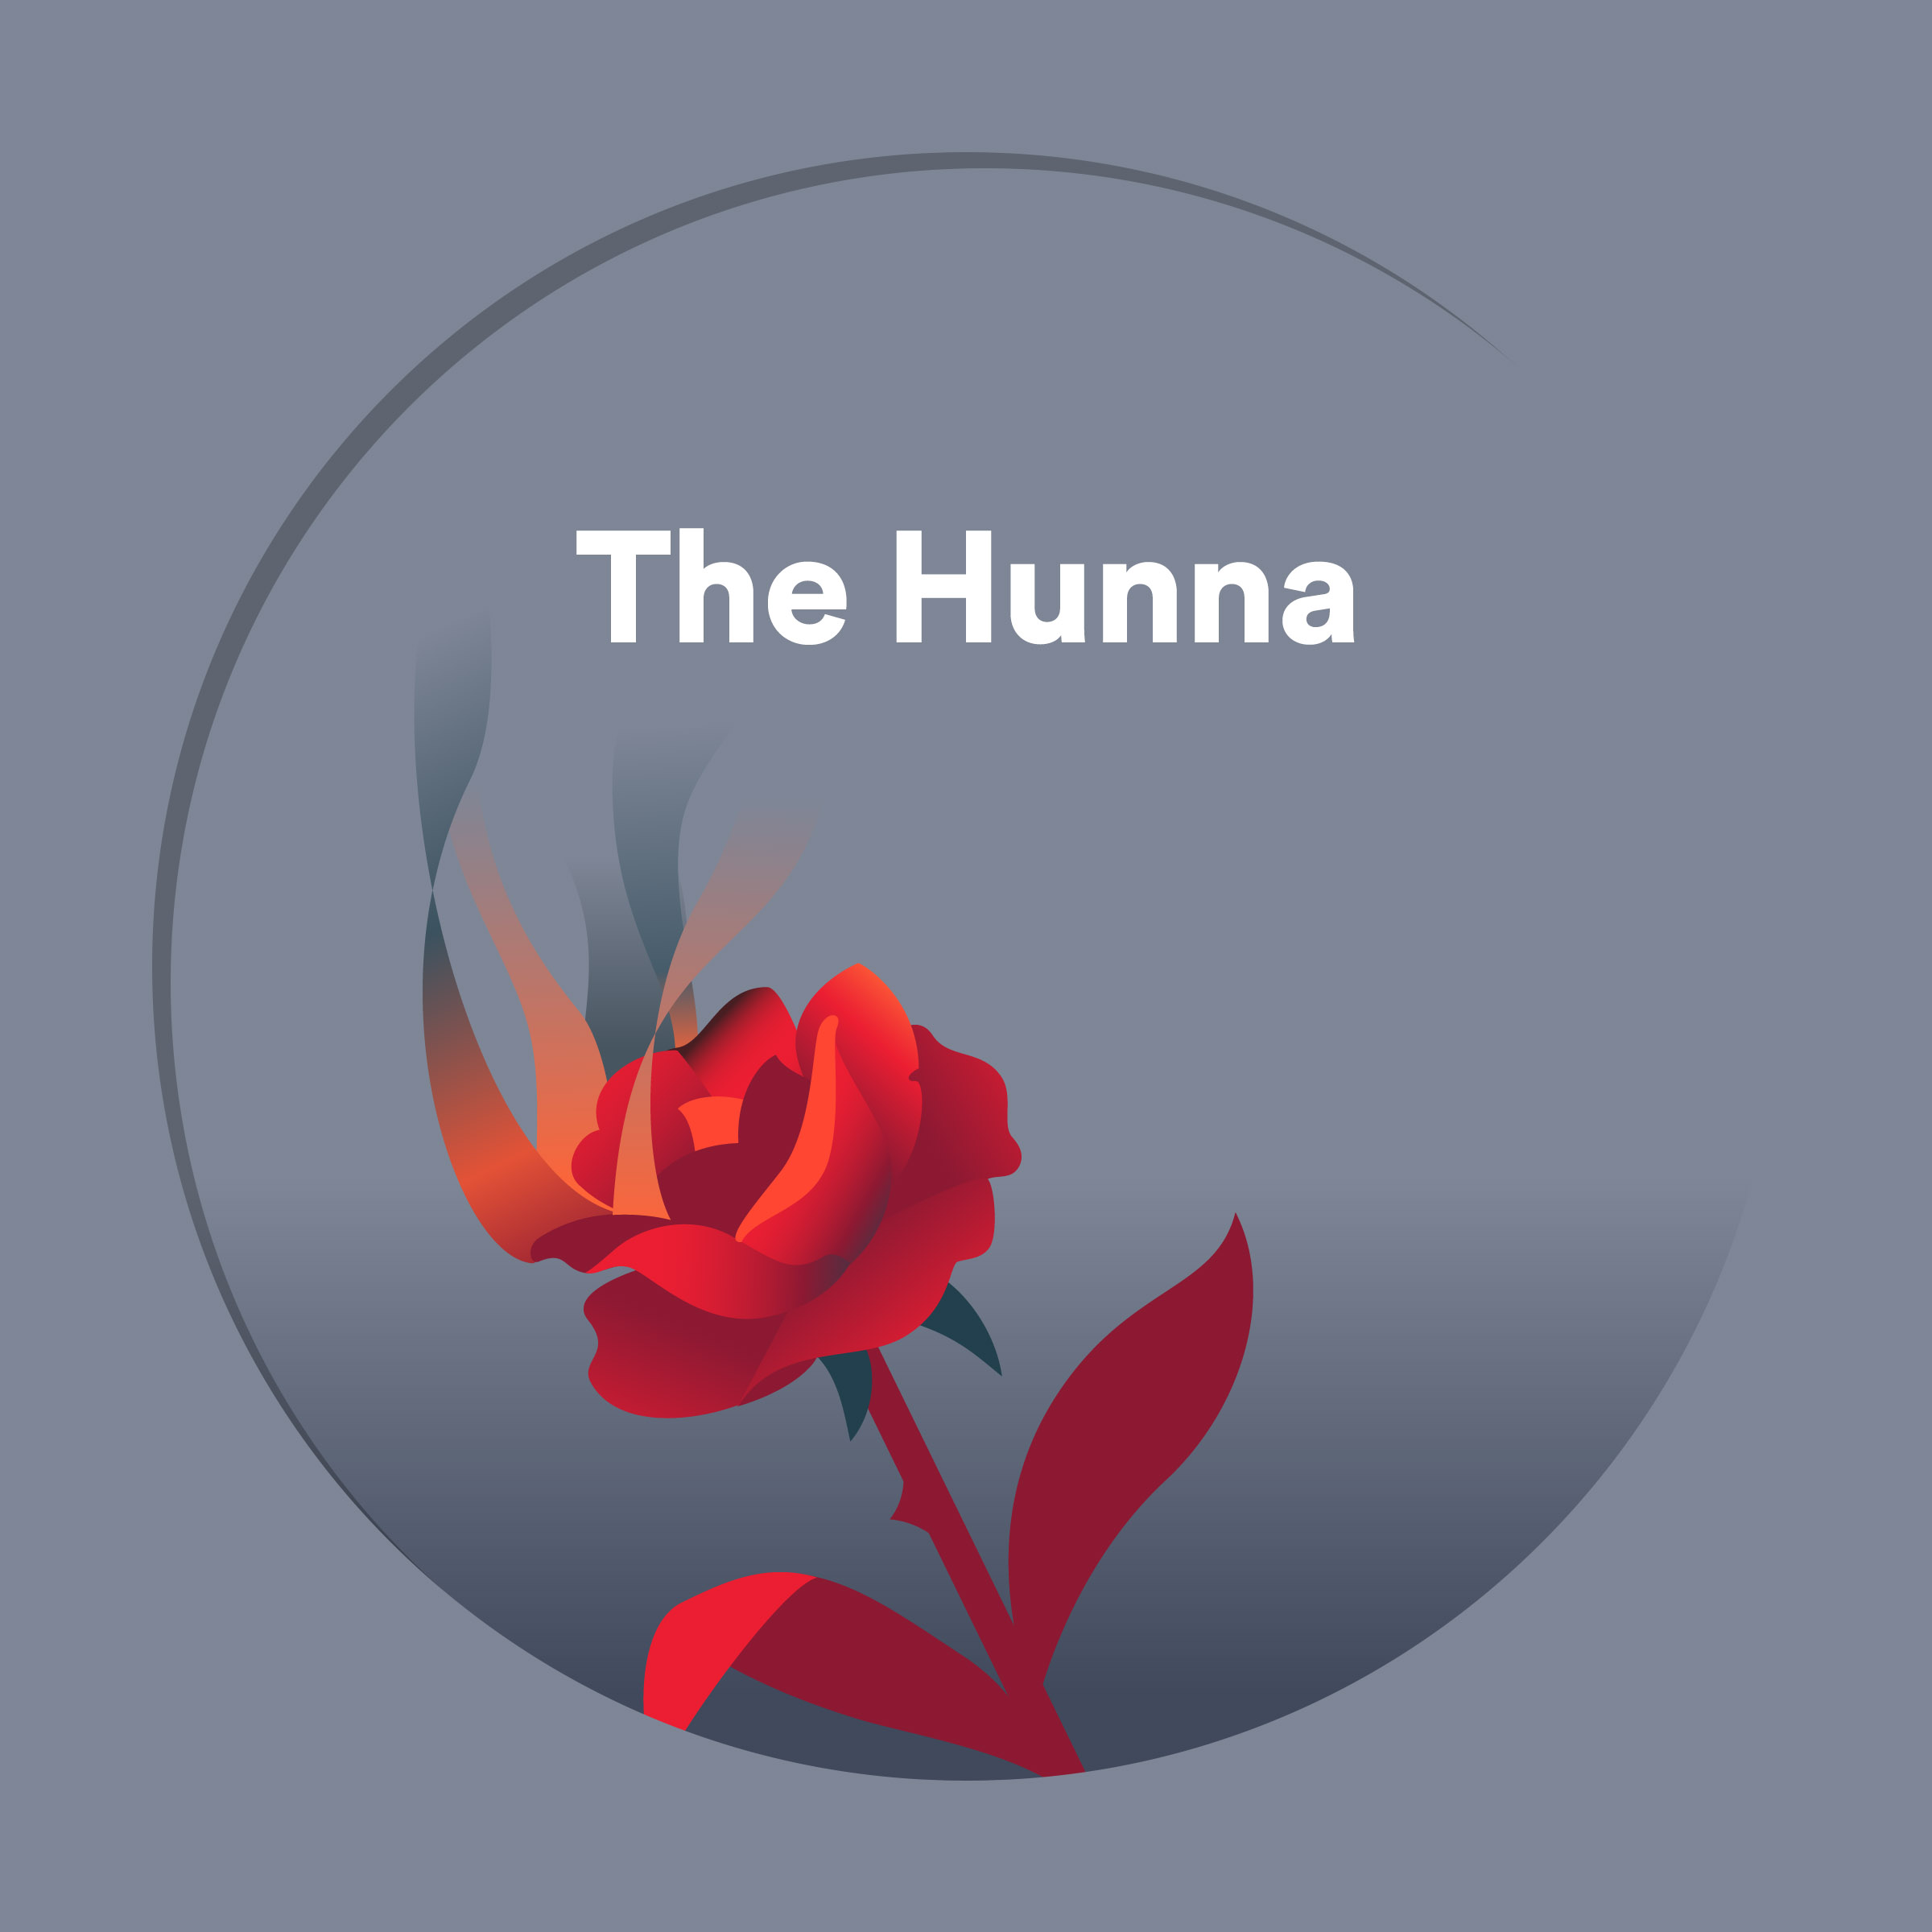 07 The_Hunna_02.jpg